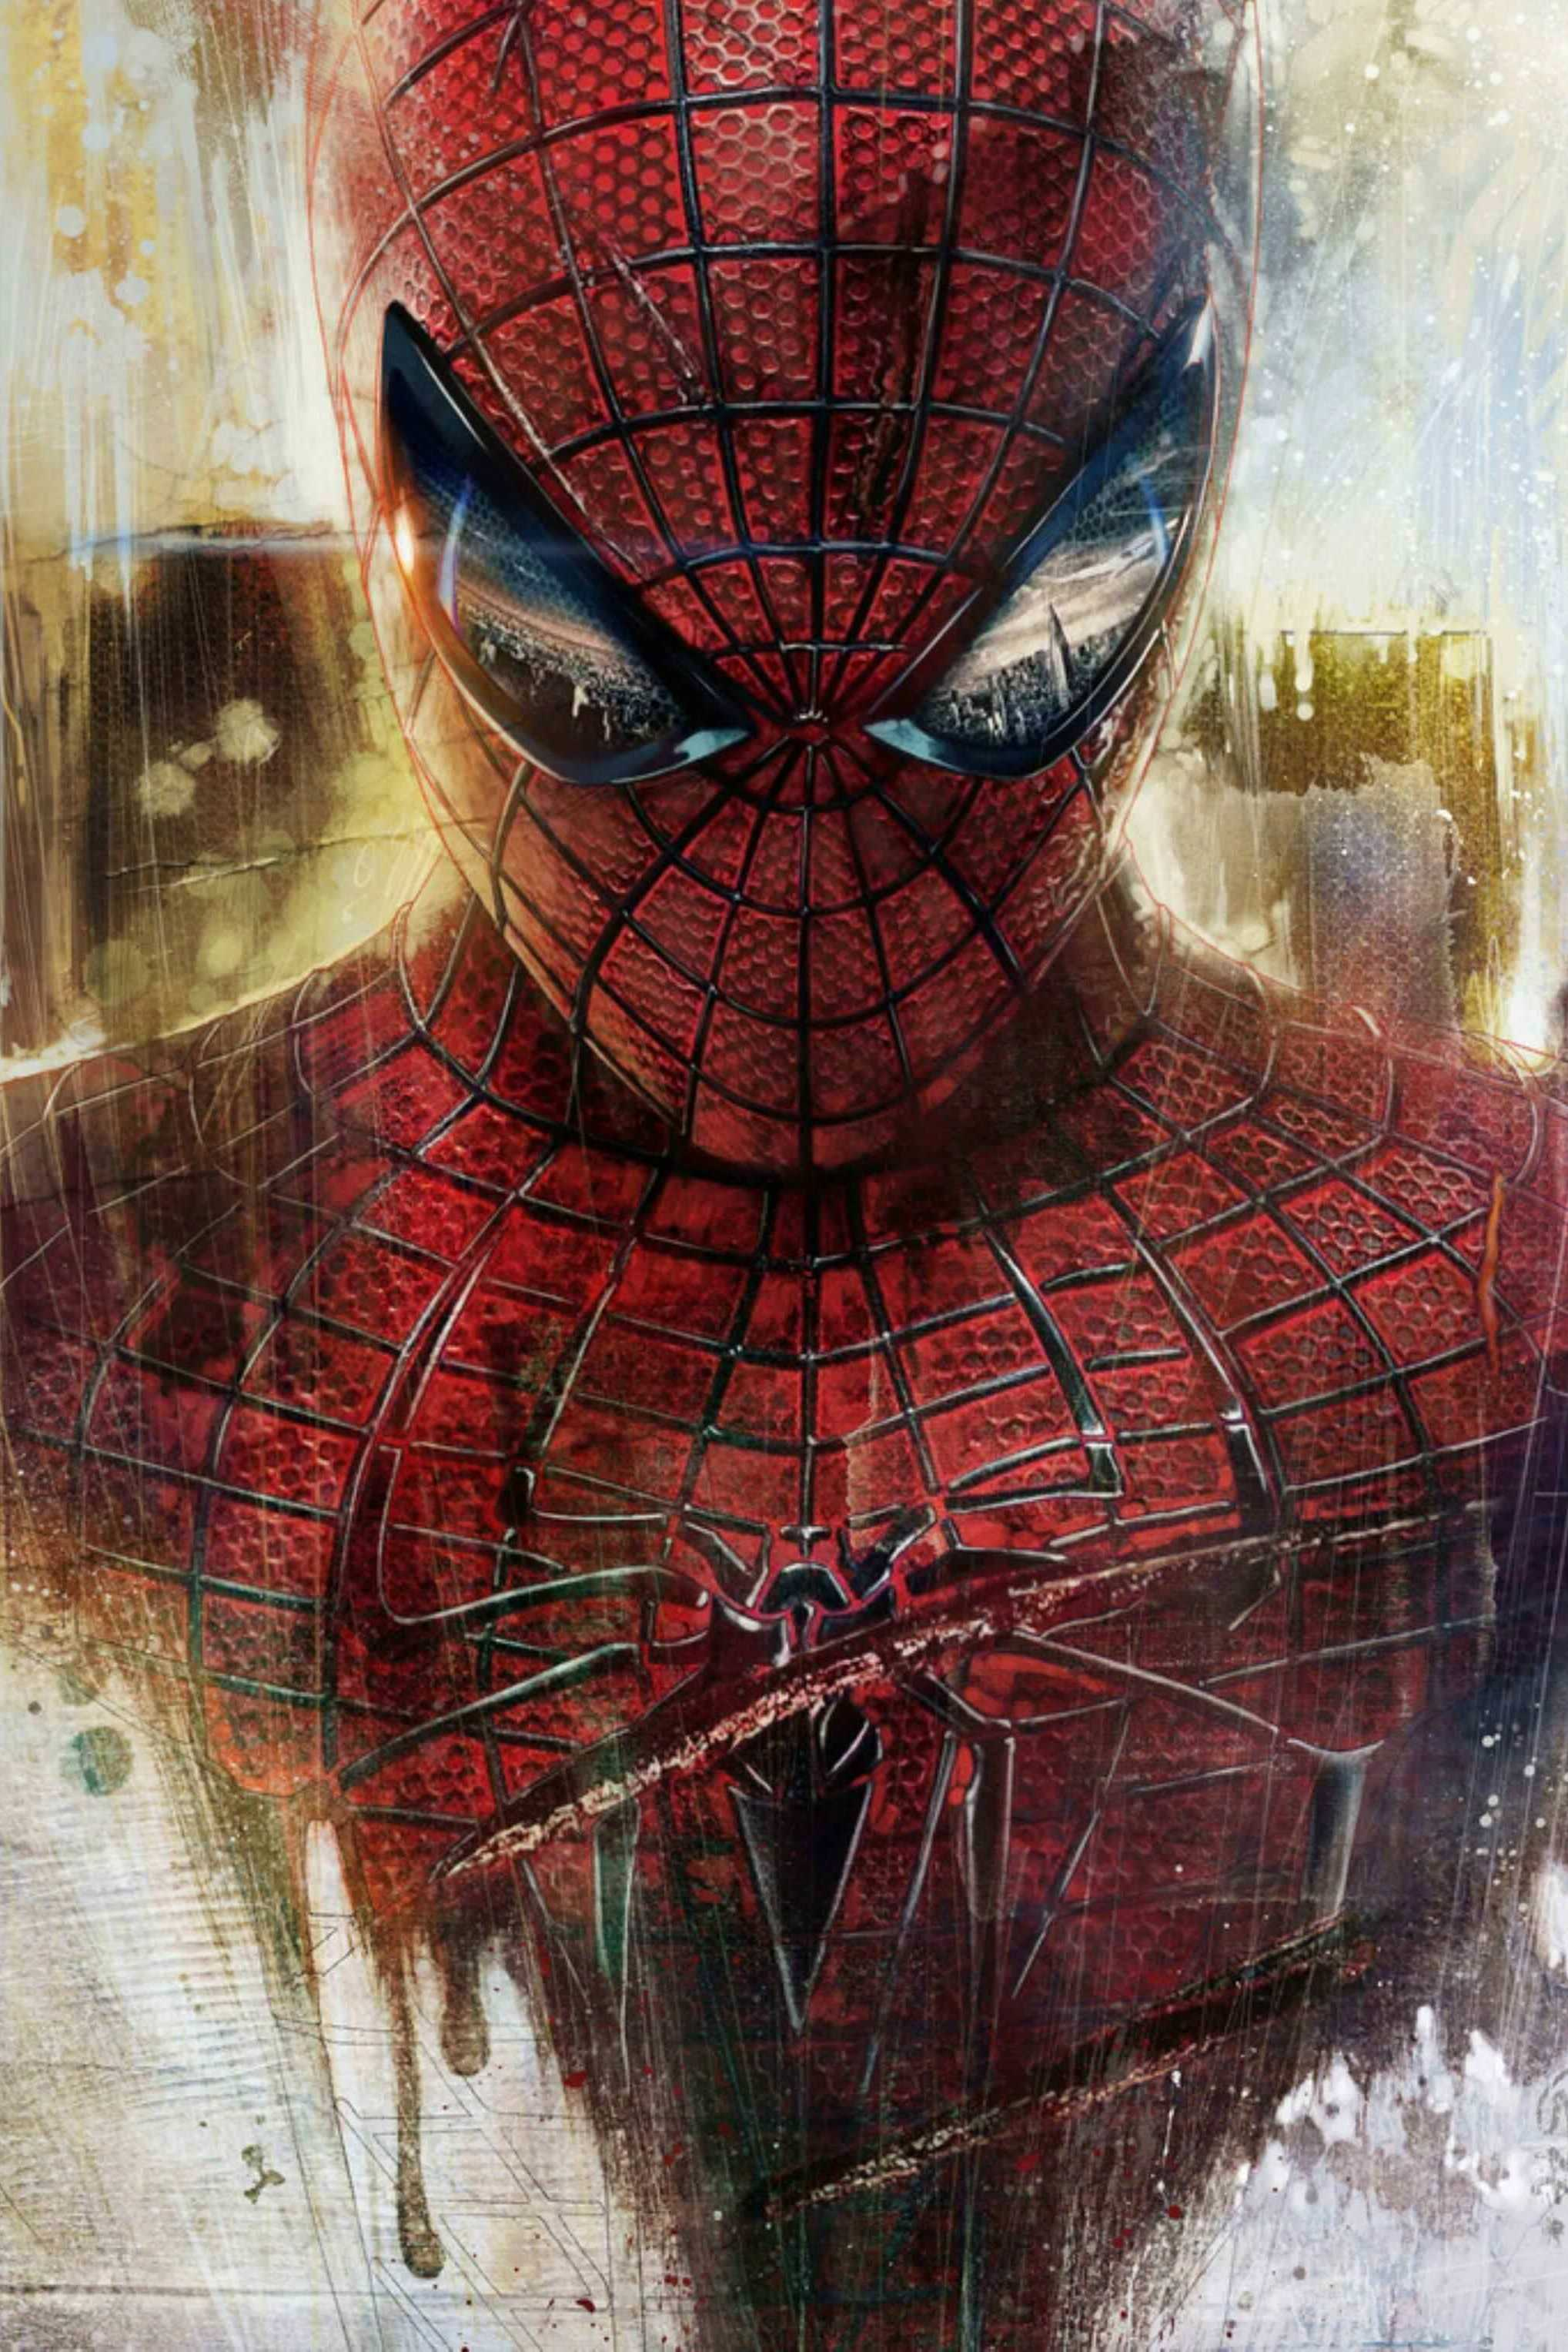 spiderman marvel art artistic painting graffiti wall color vintage decoration texture